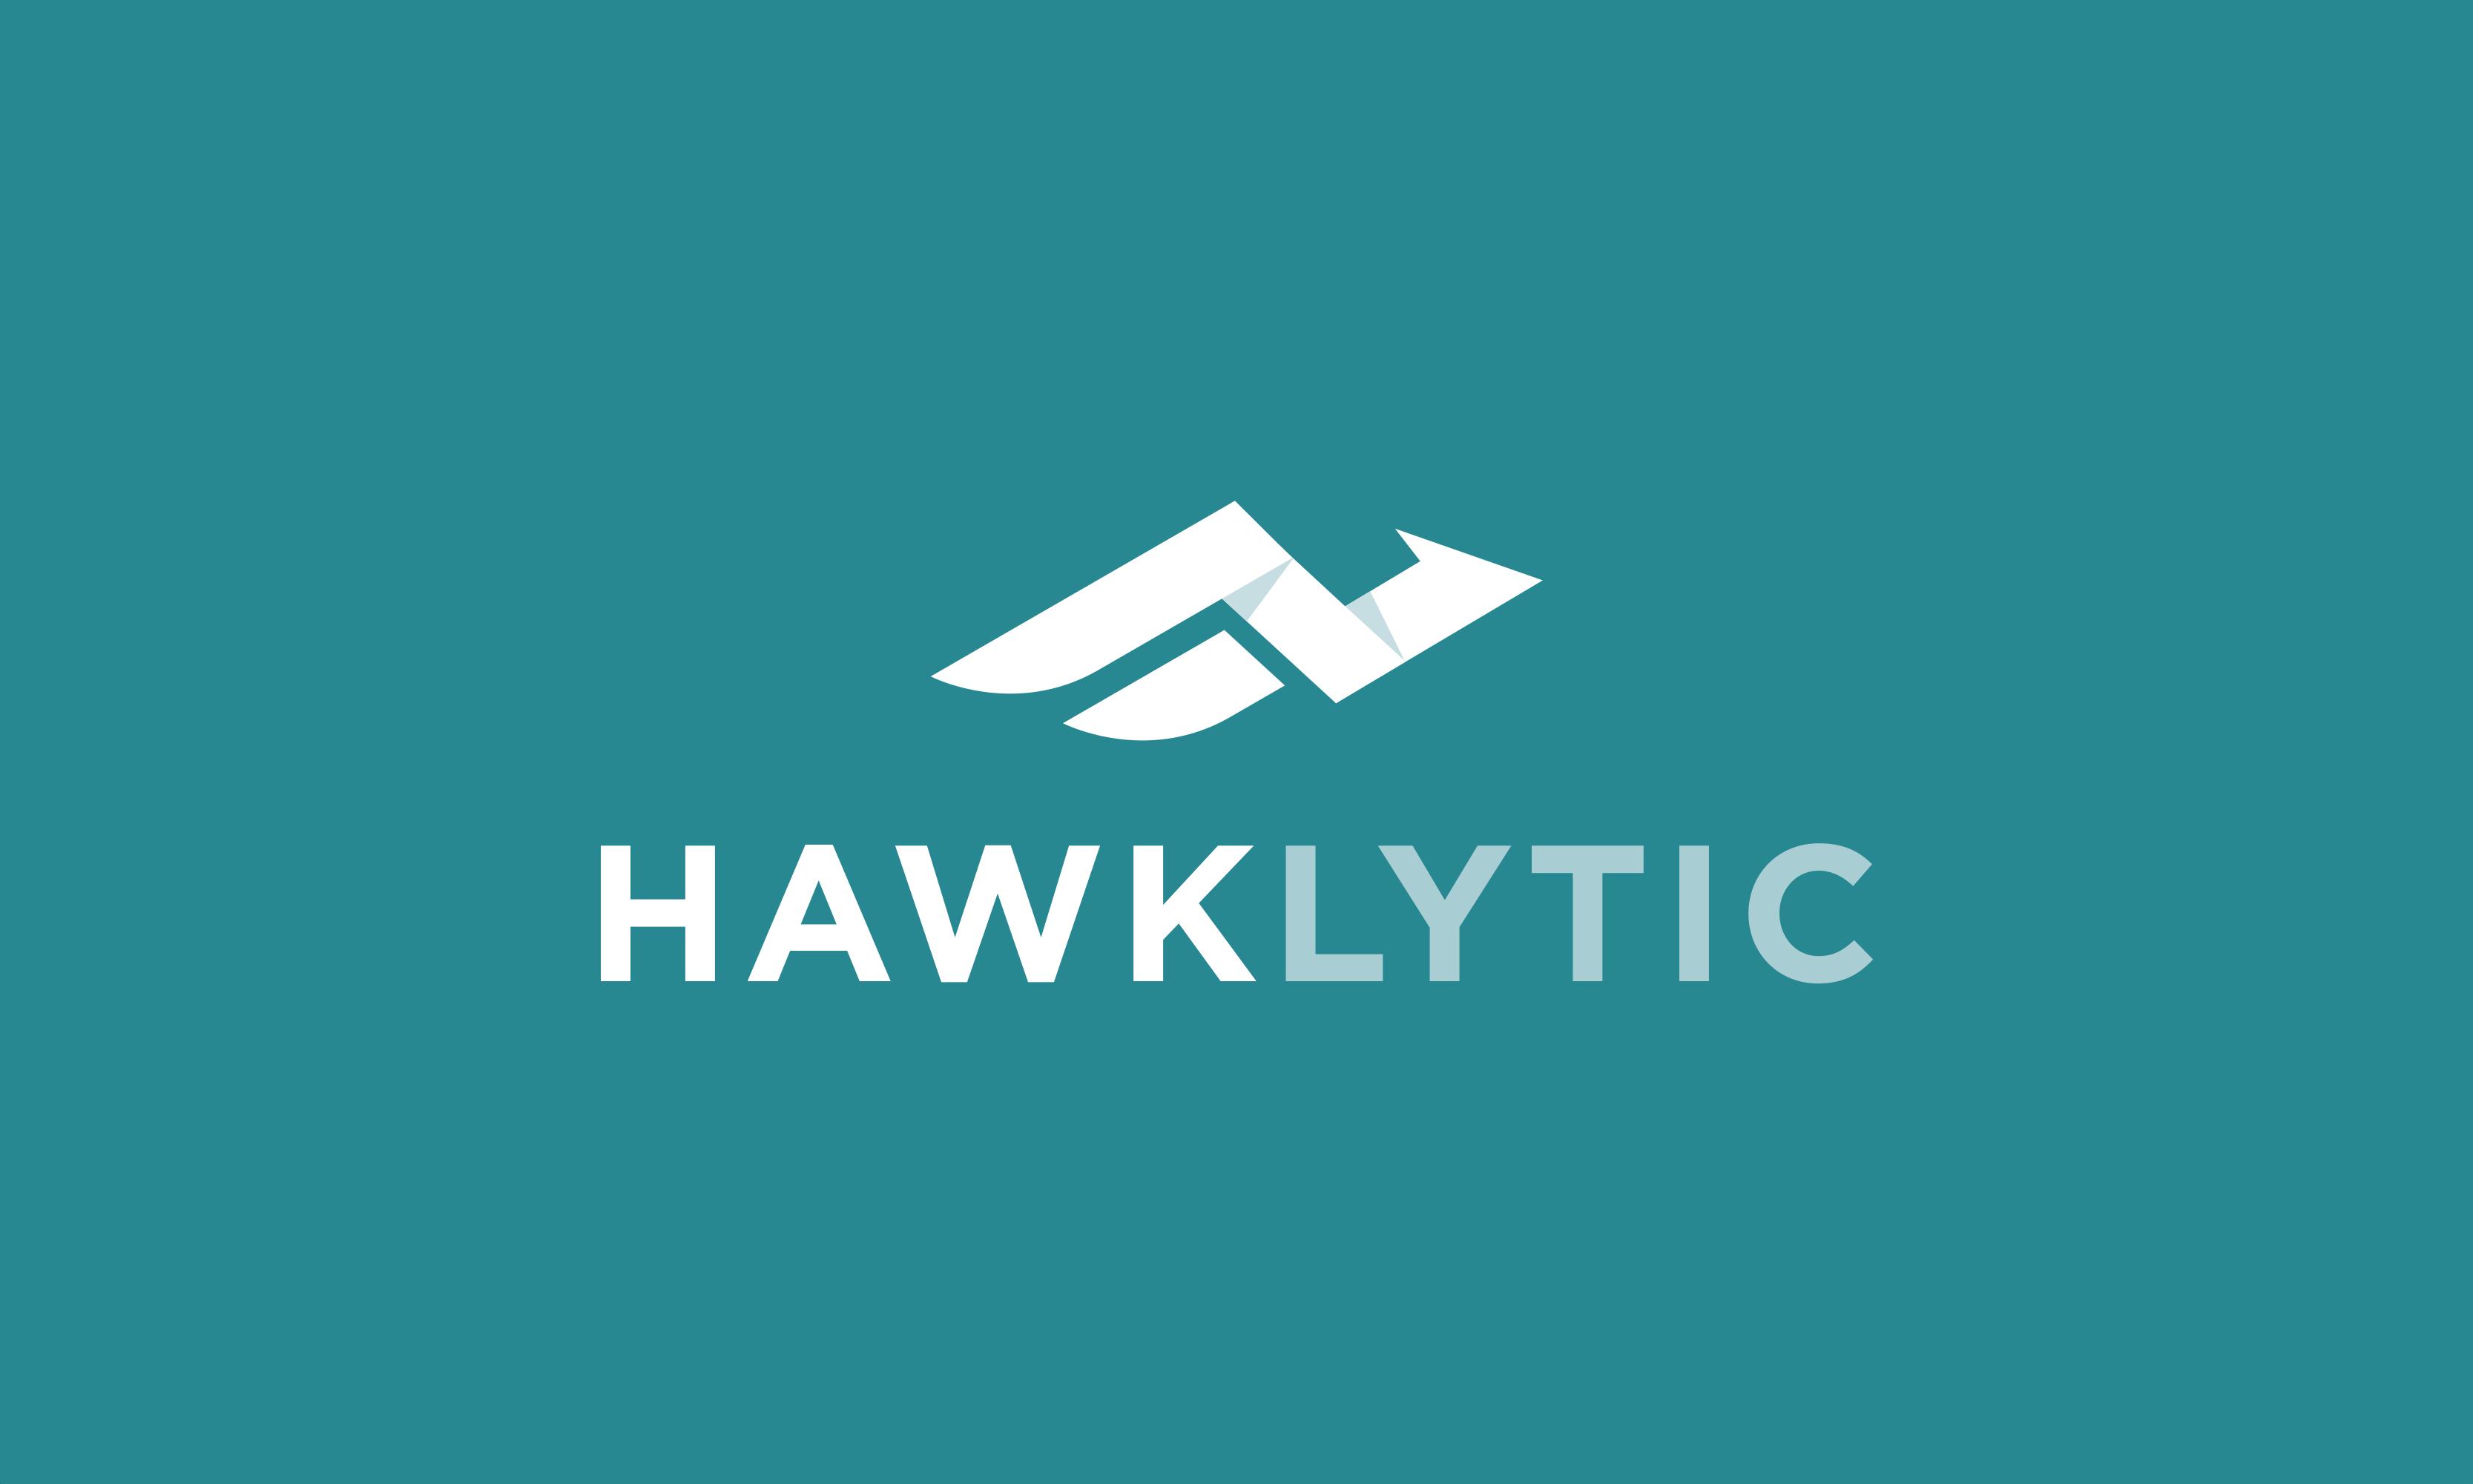 Hawklytic